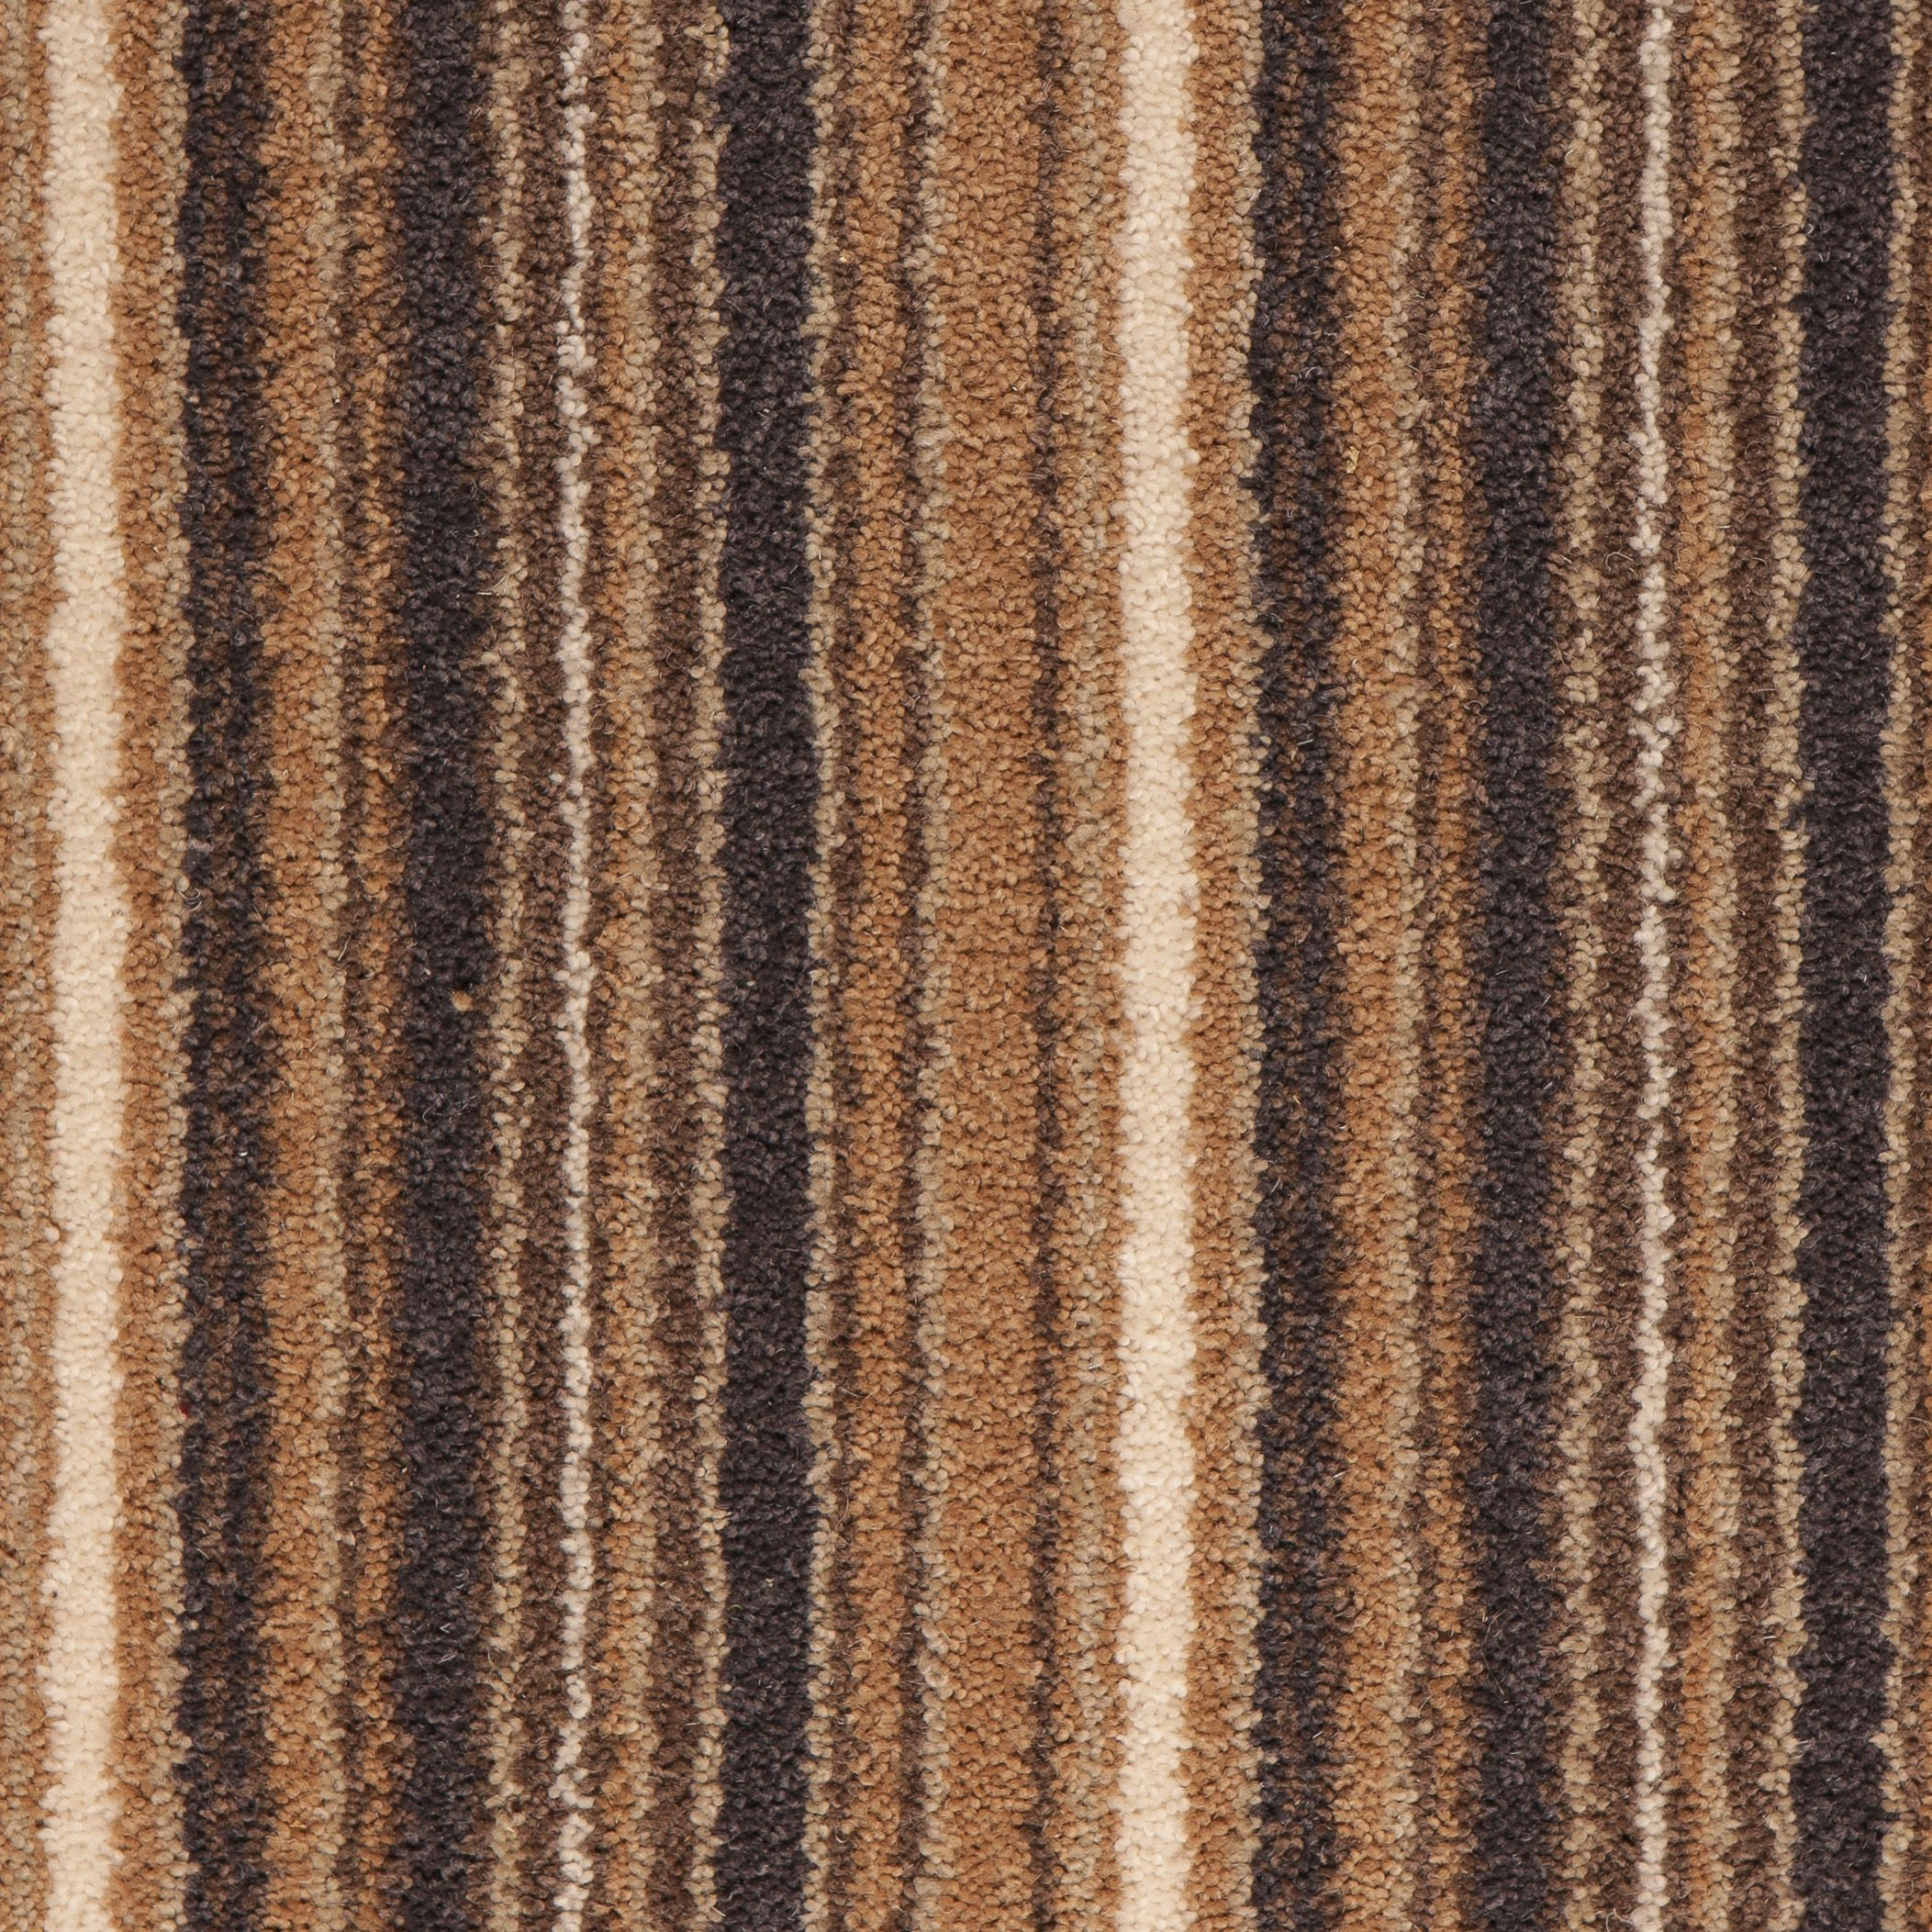 Durham Twist Carpet In Stripes Is A Stunning Axminster